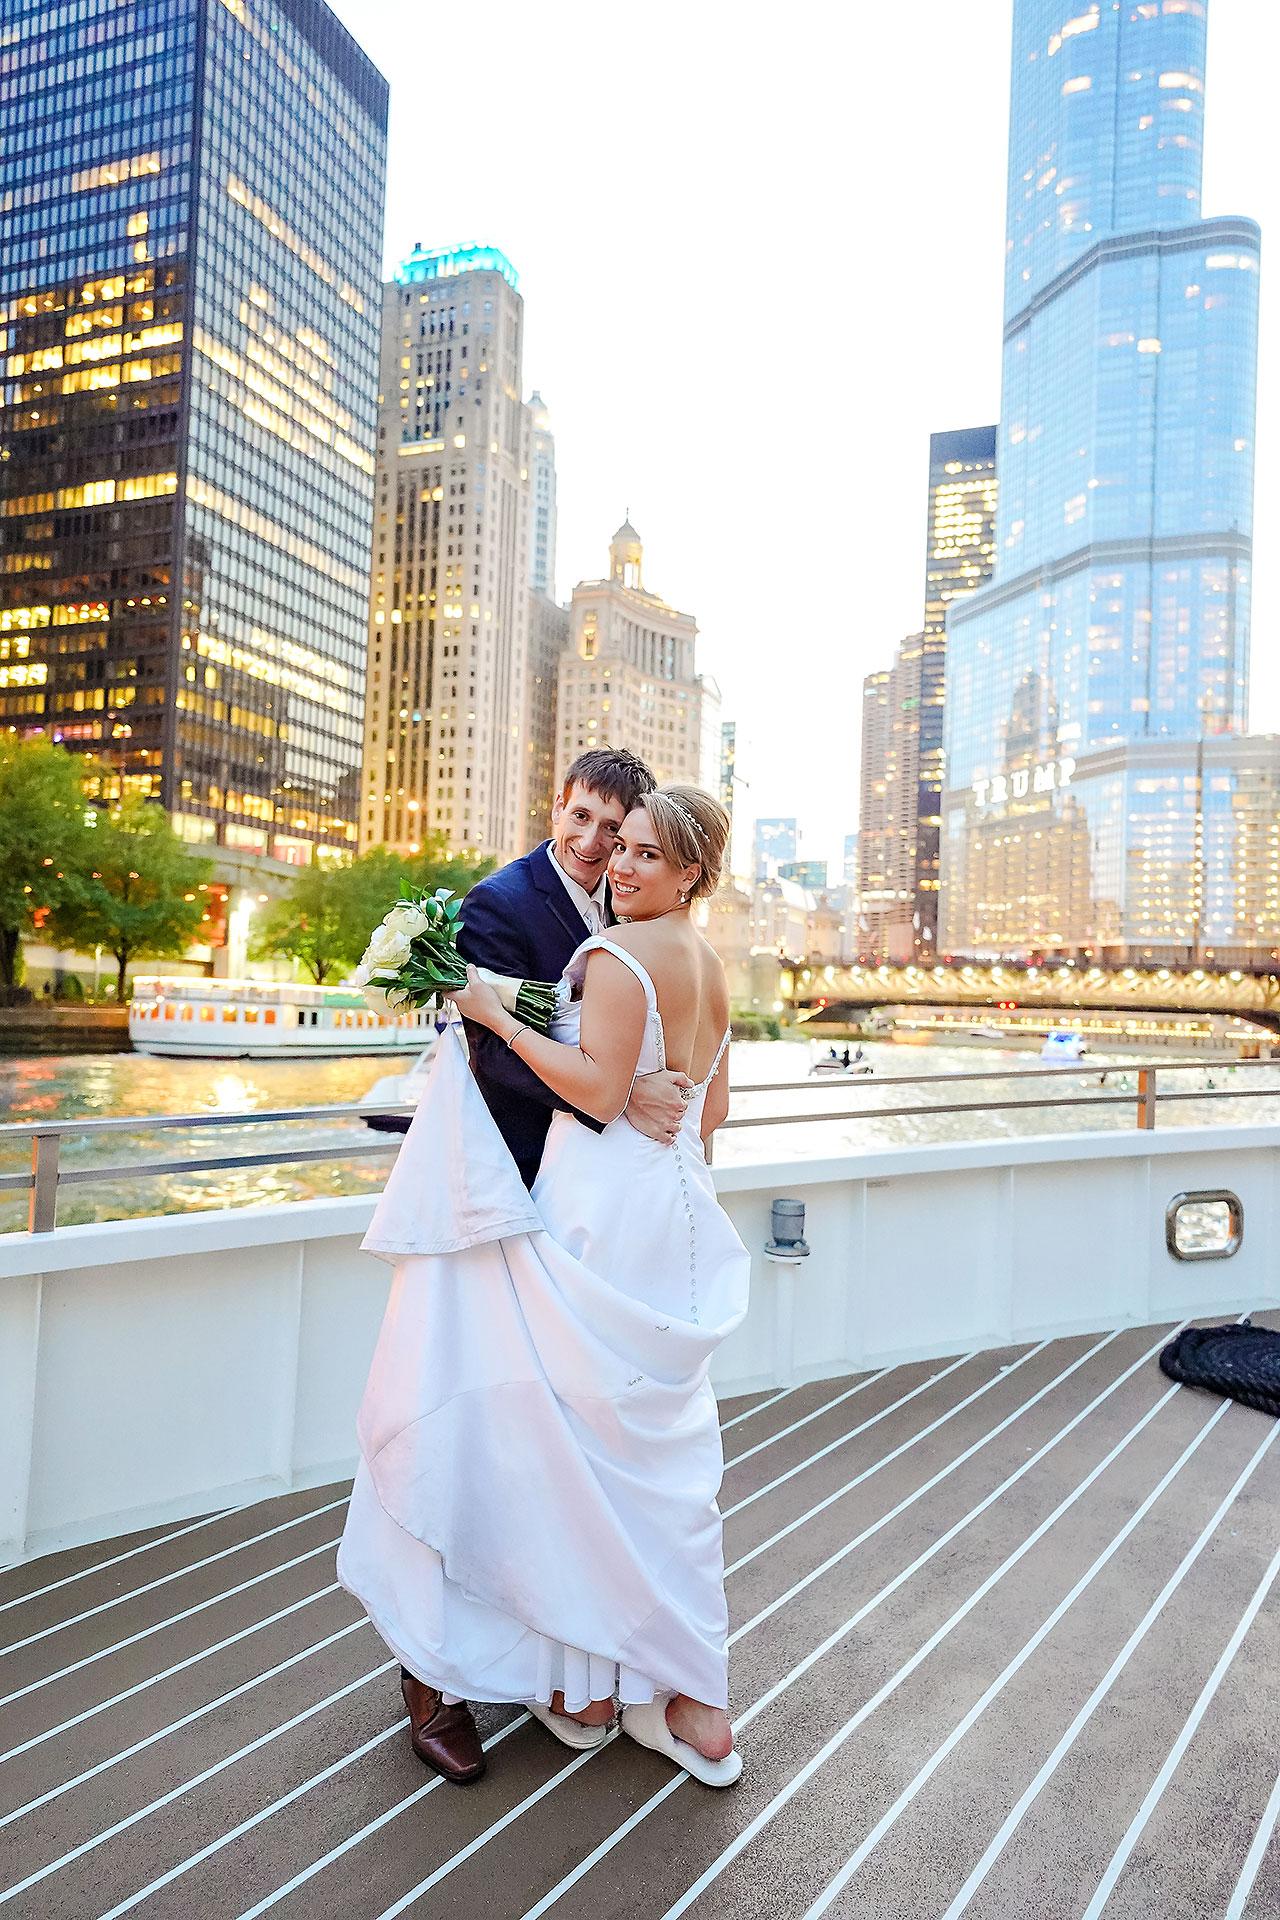 Jaclyn Matt Odessy Chicago River Cruise Wedding 196